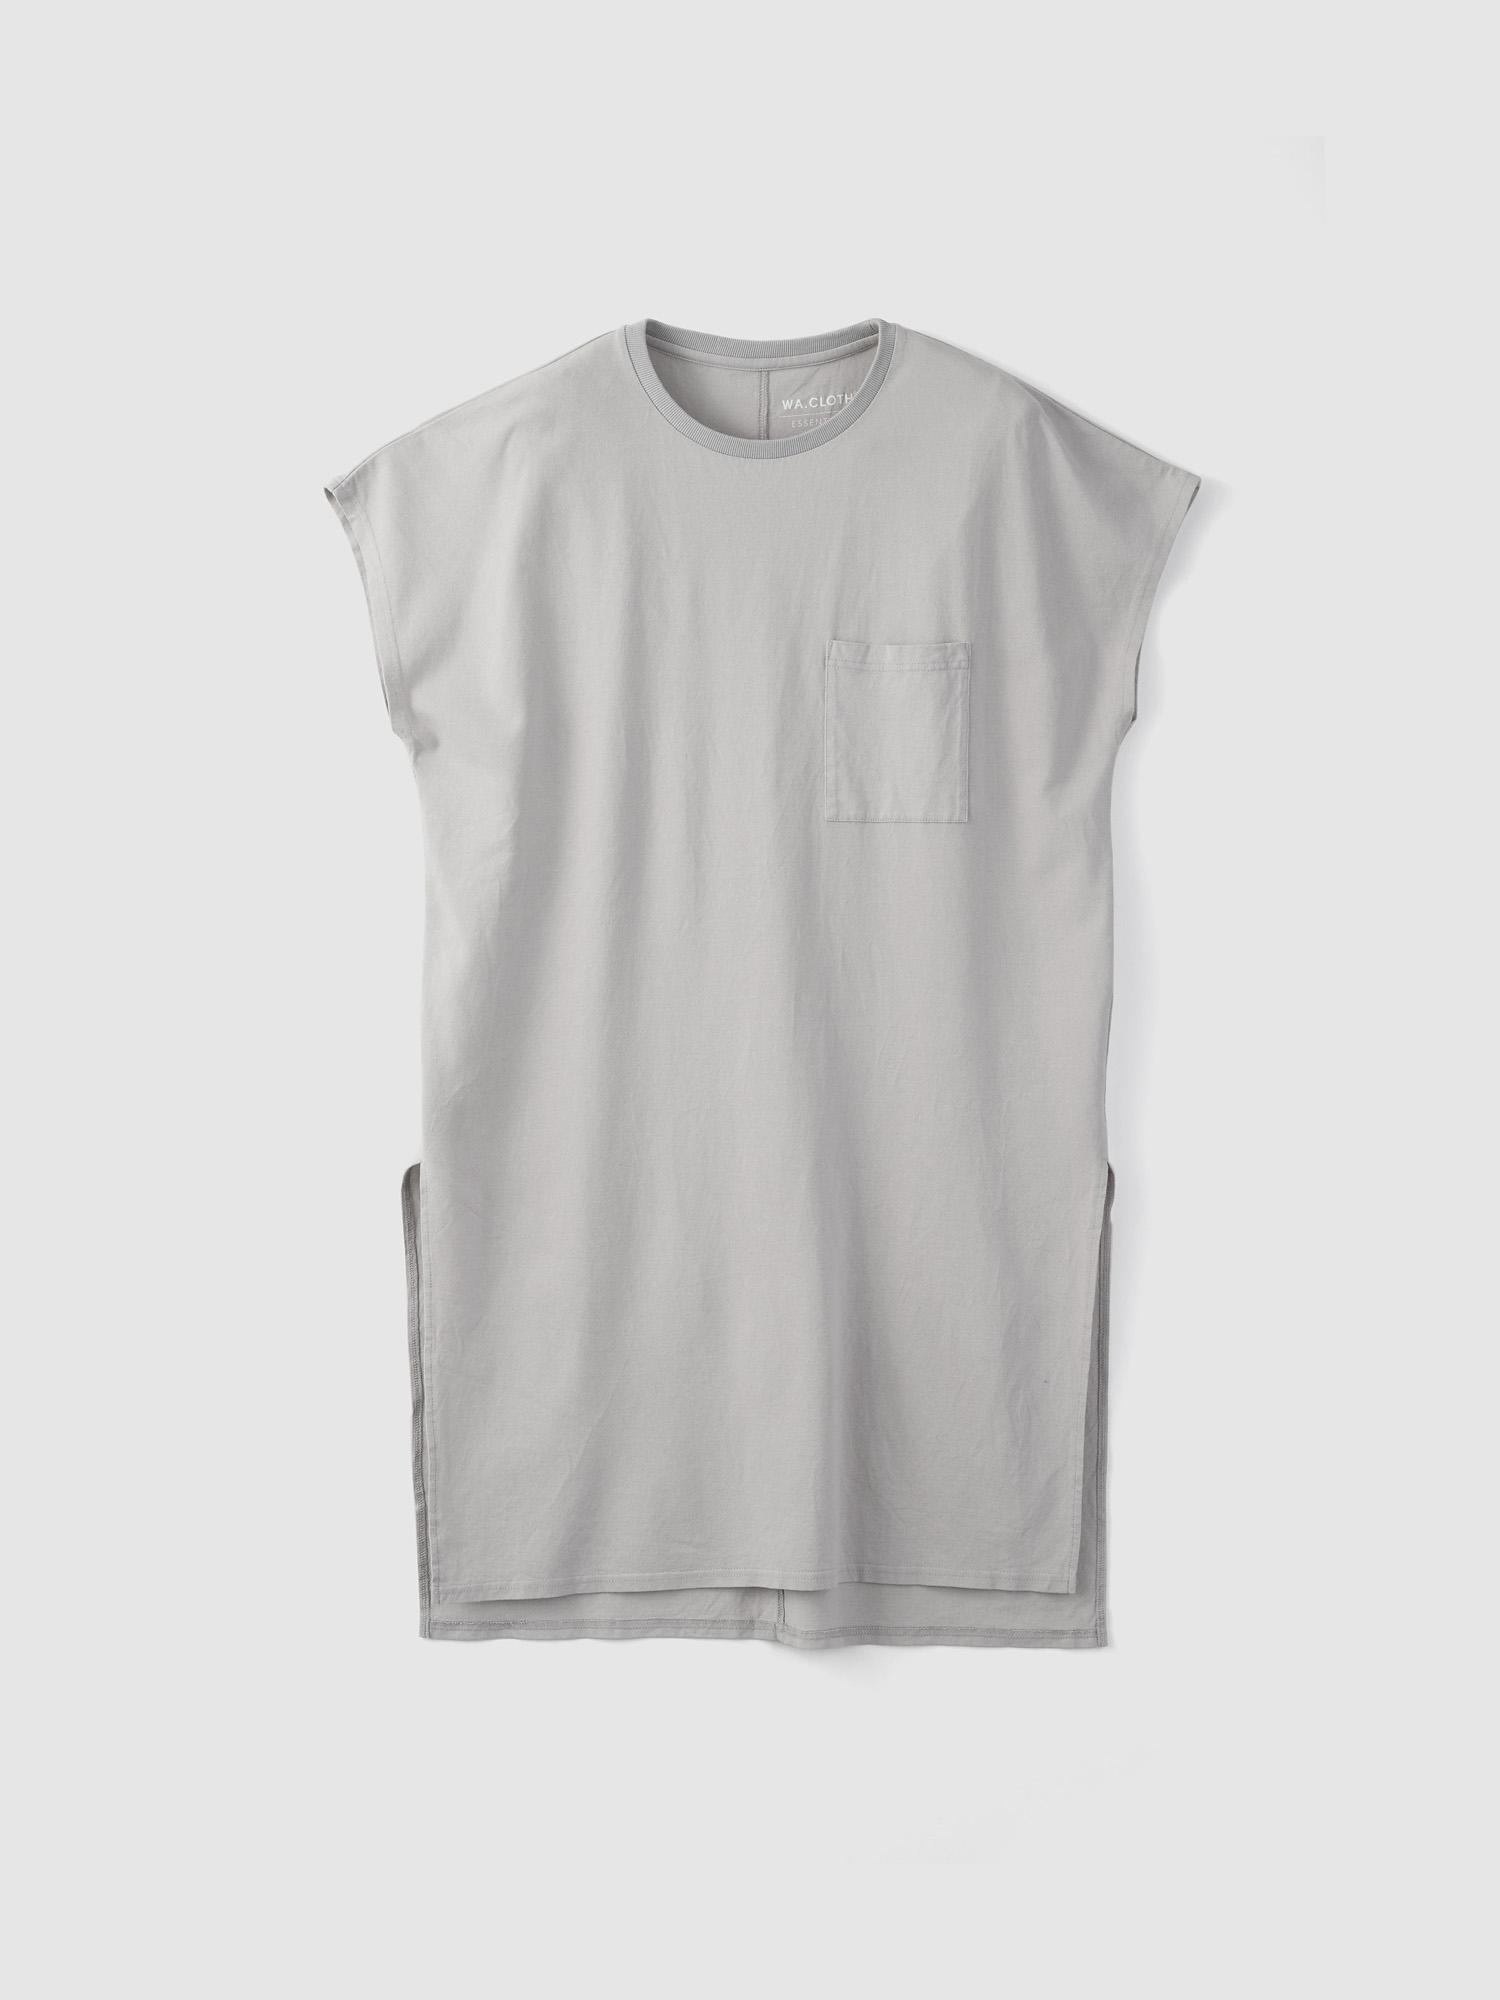 Women's COMFORT DRESS TUNIC T-SHIRTのサムネイル3